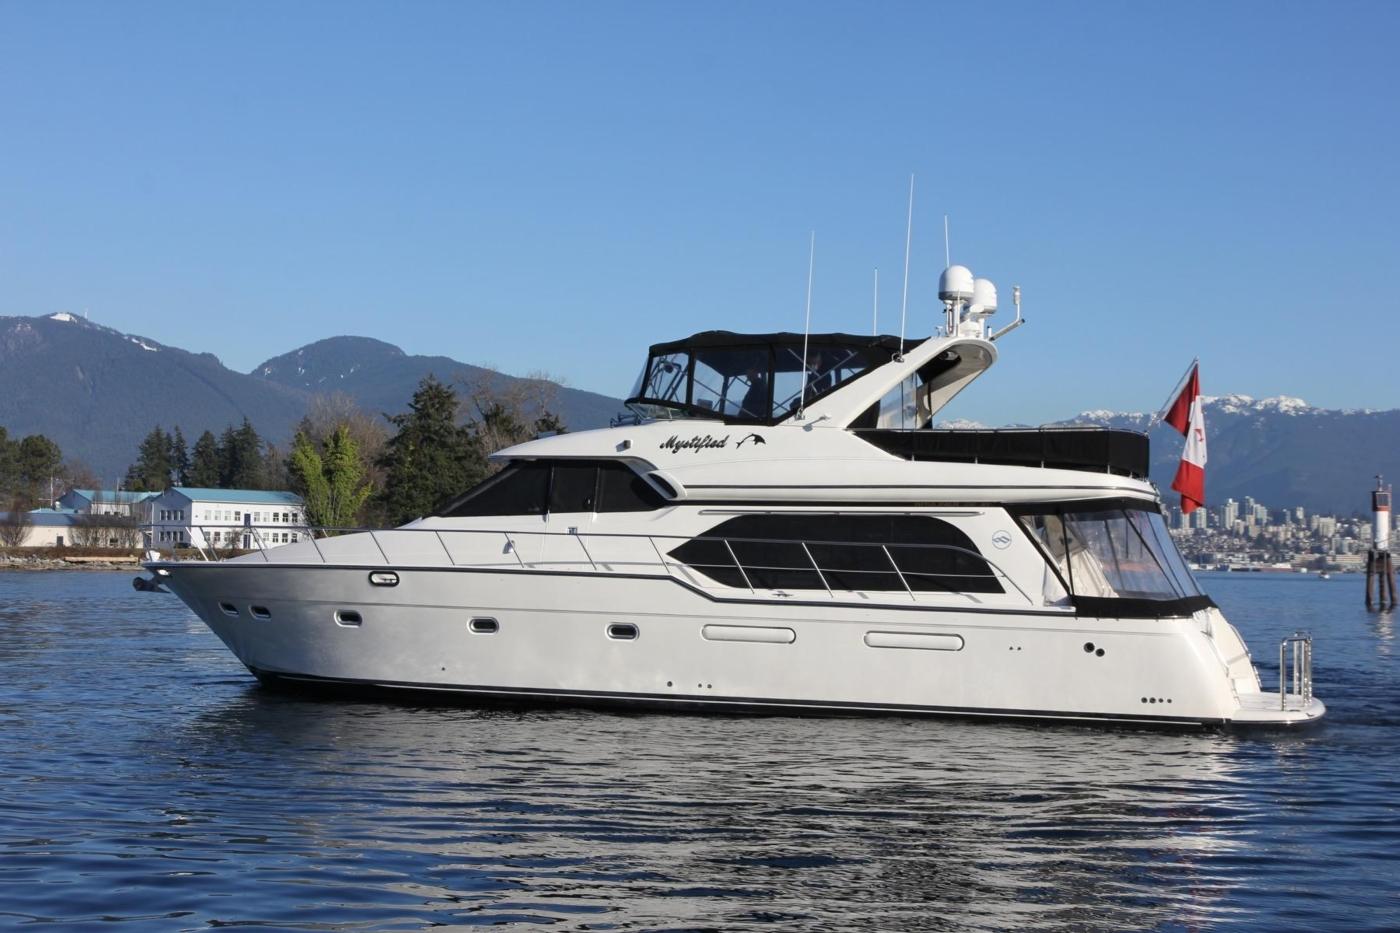 1999 Bayliner 5788 Pilot House Motoryacht, Portside Profile